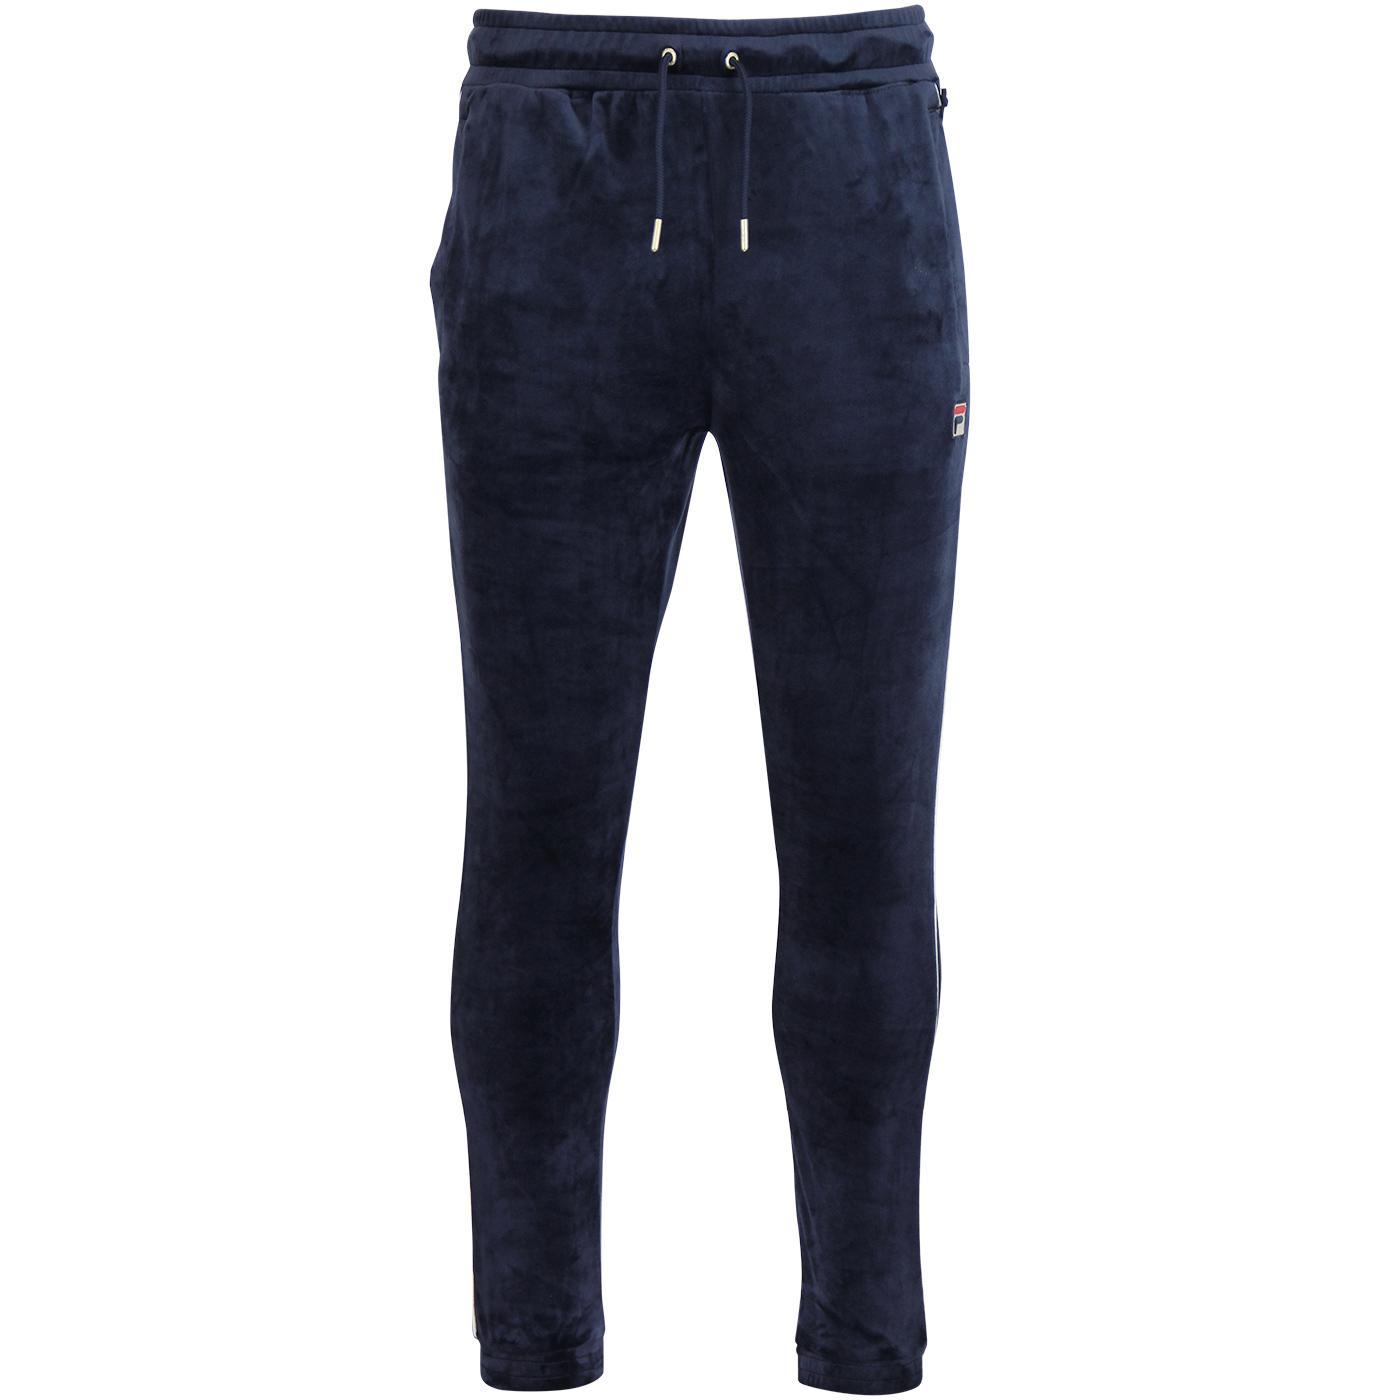 Bounty FILA VINTAGE Terrinda Style Track Pants (P)